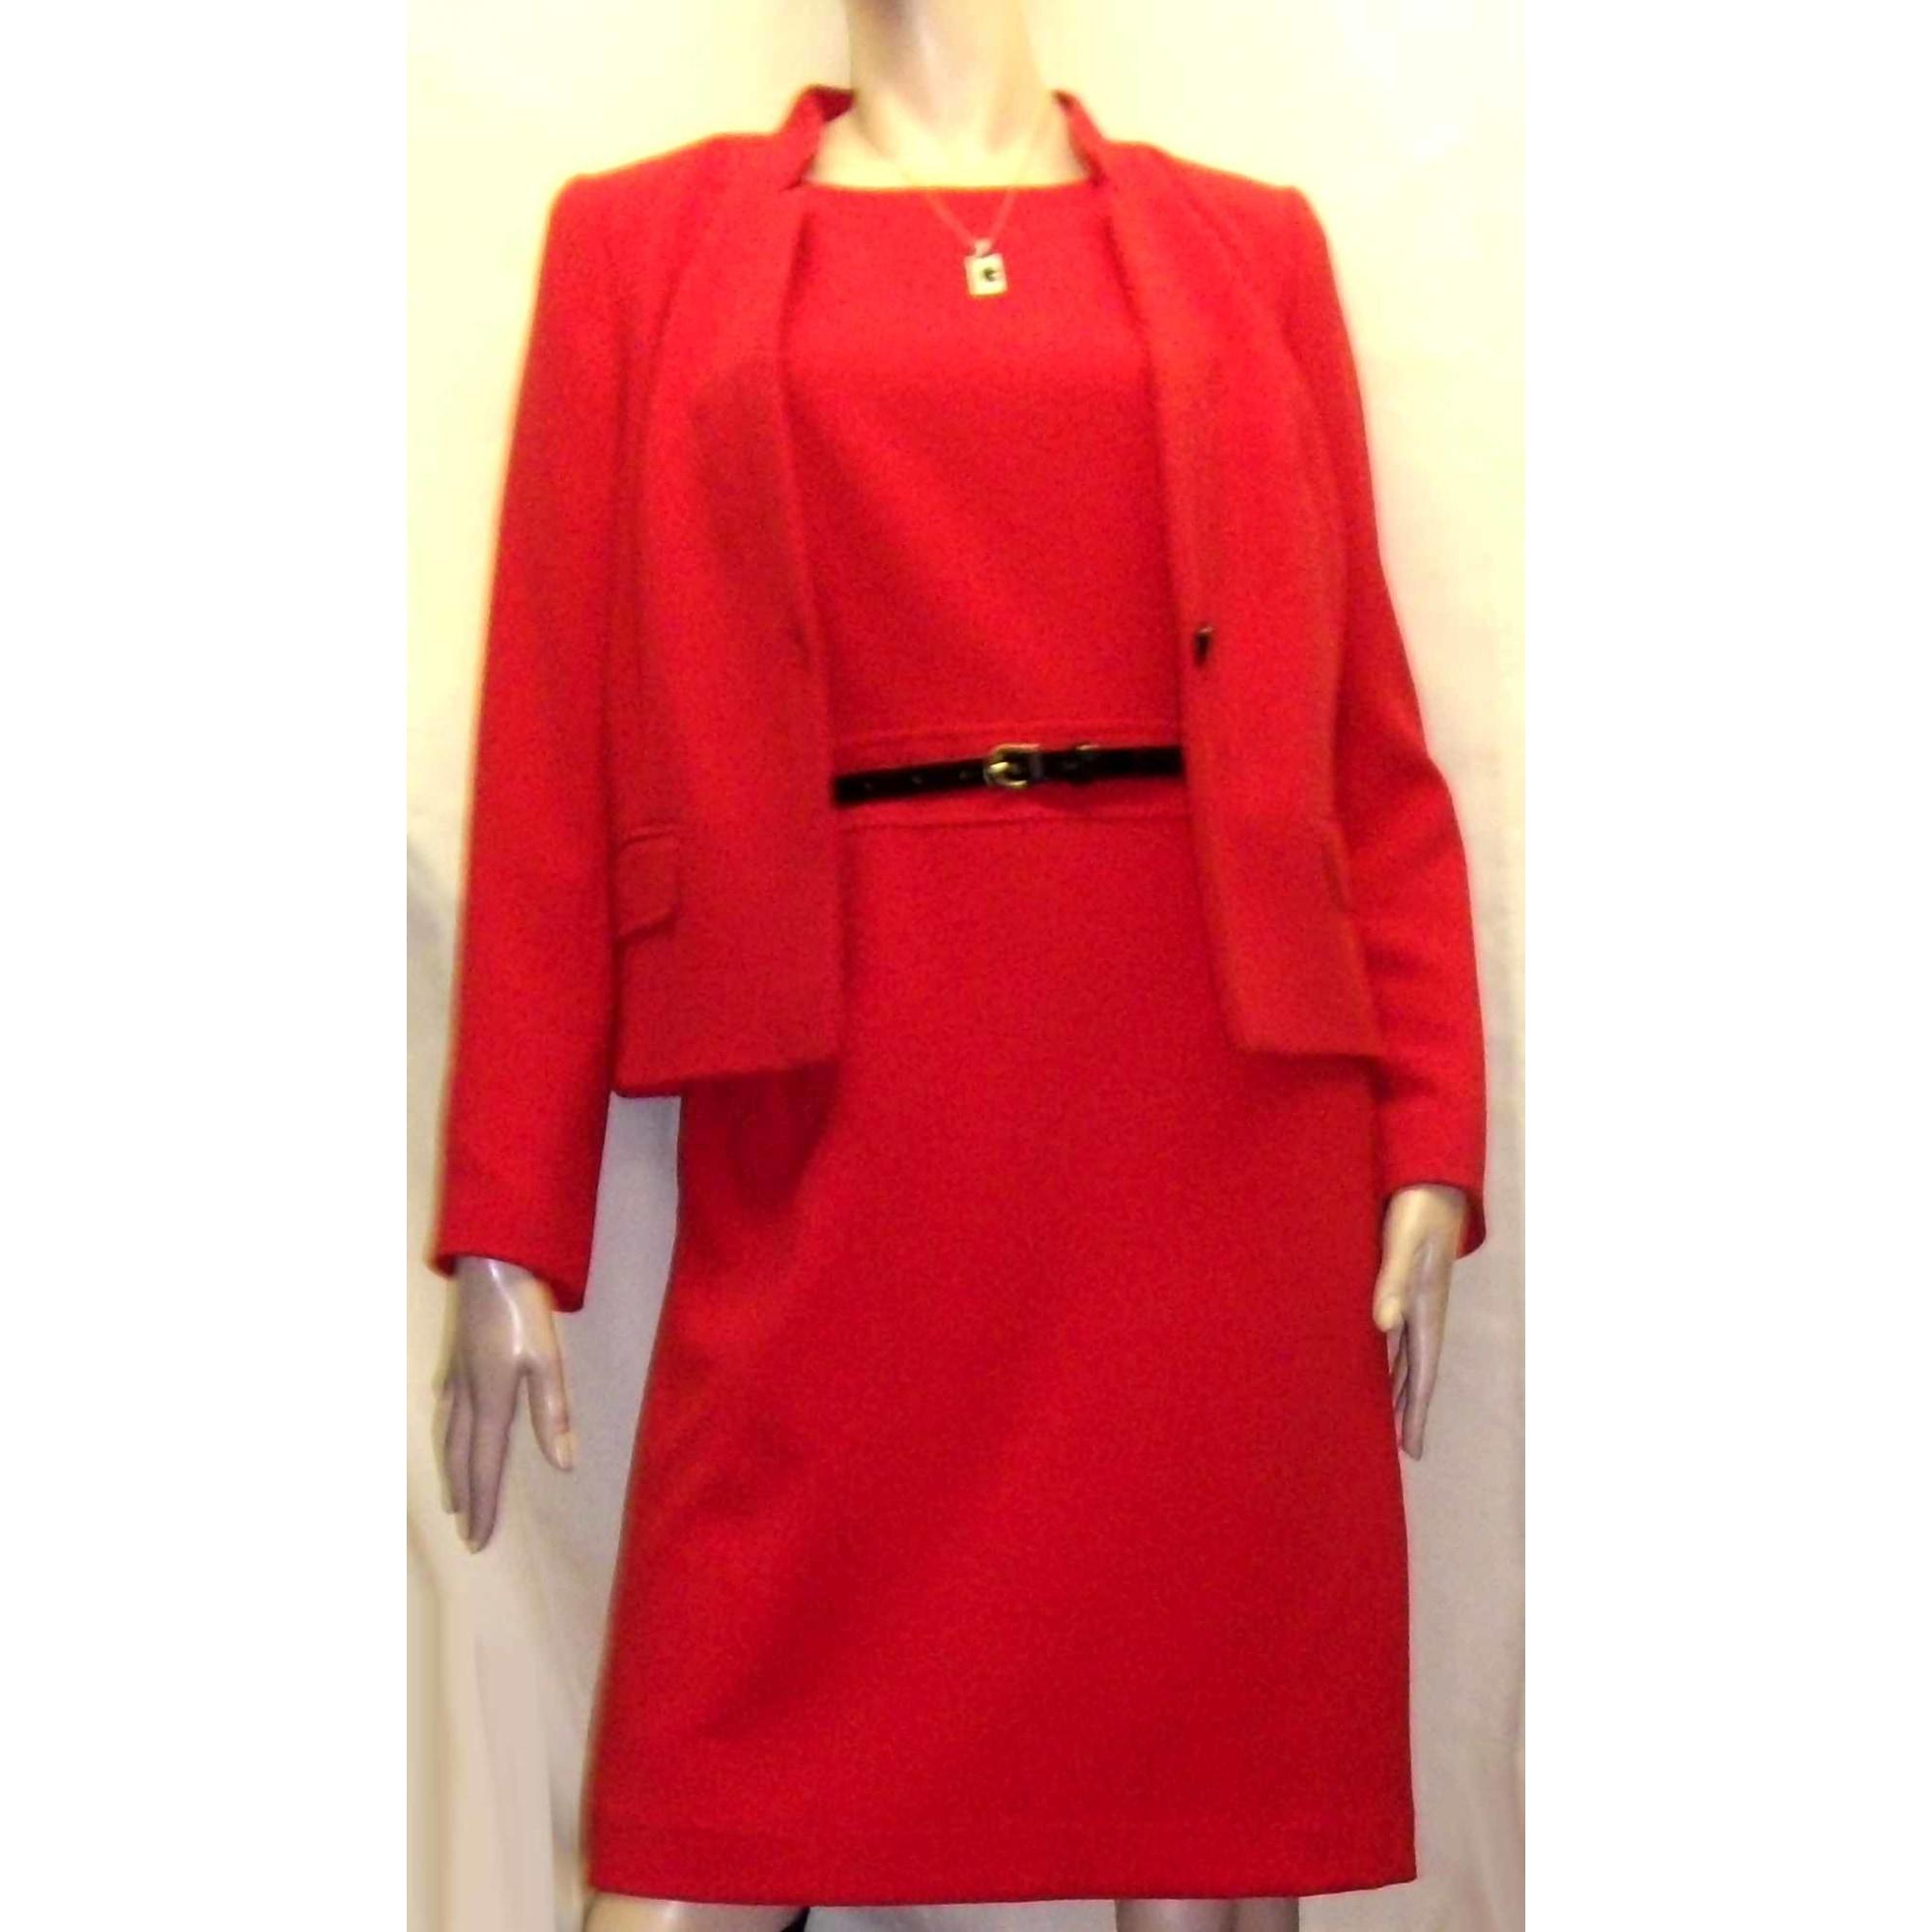 d44ed1e8861 Tailleur robe ANTONELLE 40 (L